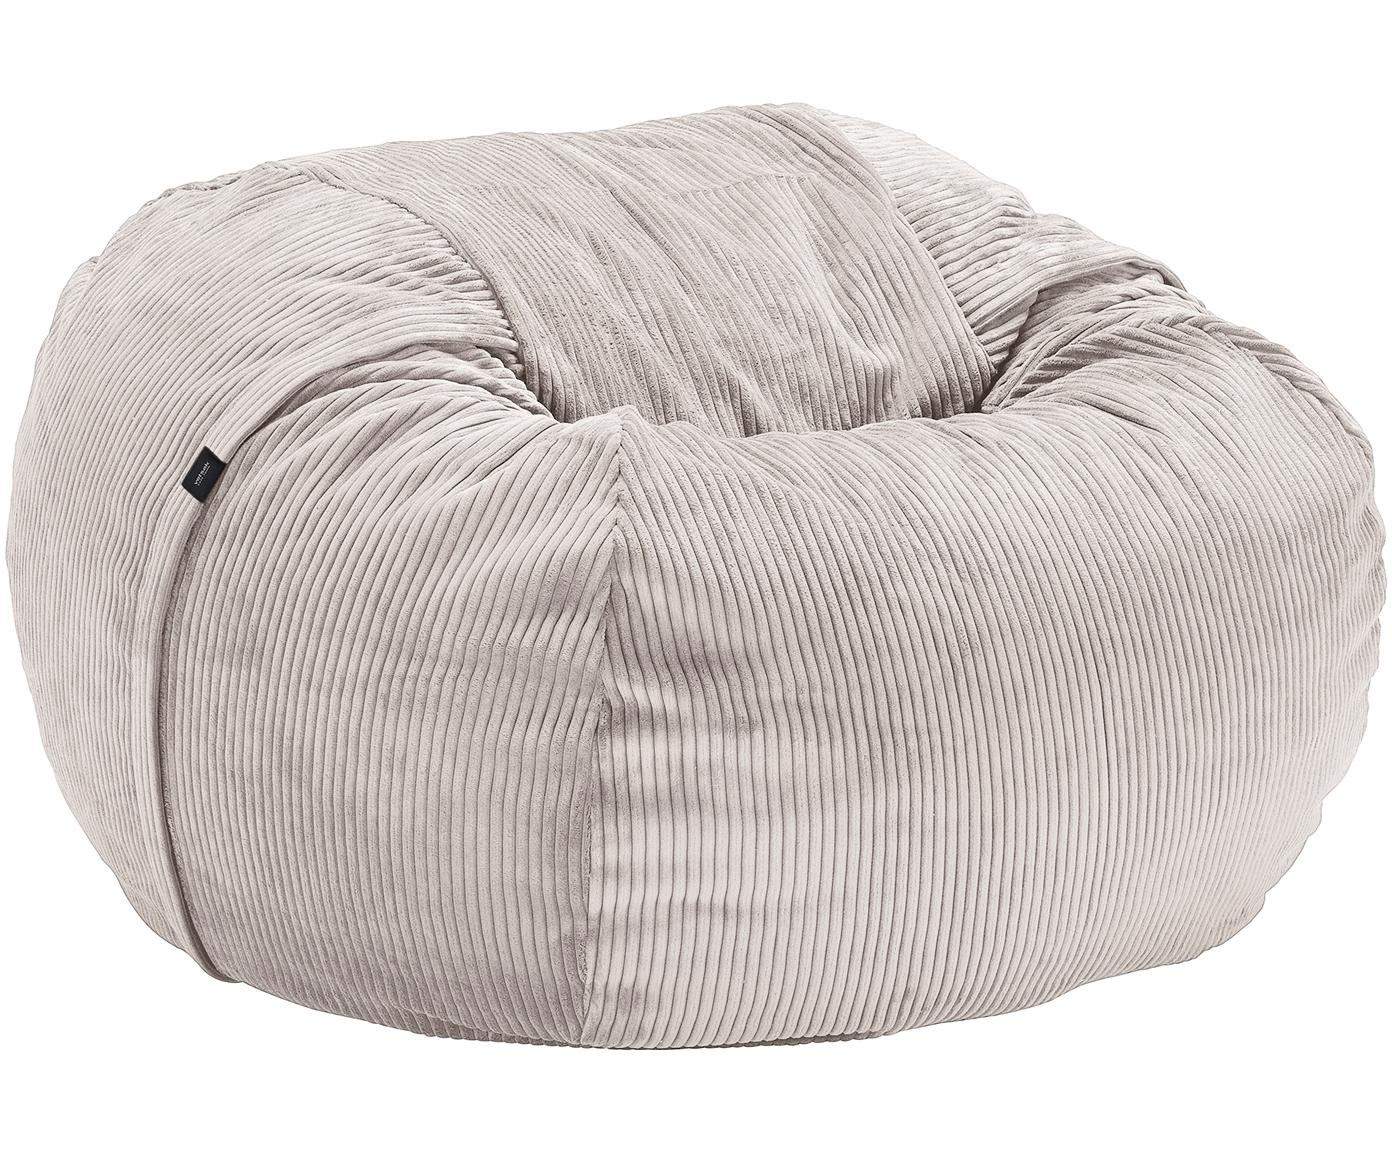 Pouf sacco in velluto a coste Velours, Rivestimento: 88% nylon, 12% poliestere, Platino, Ø 110 x Alt. 70 cm